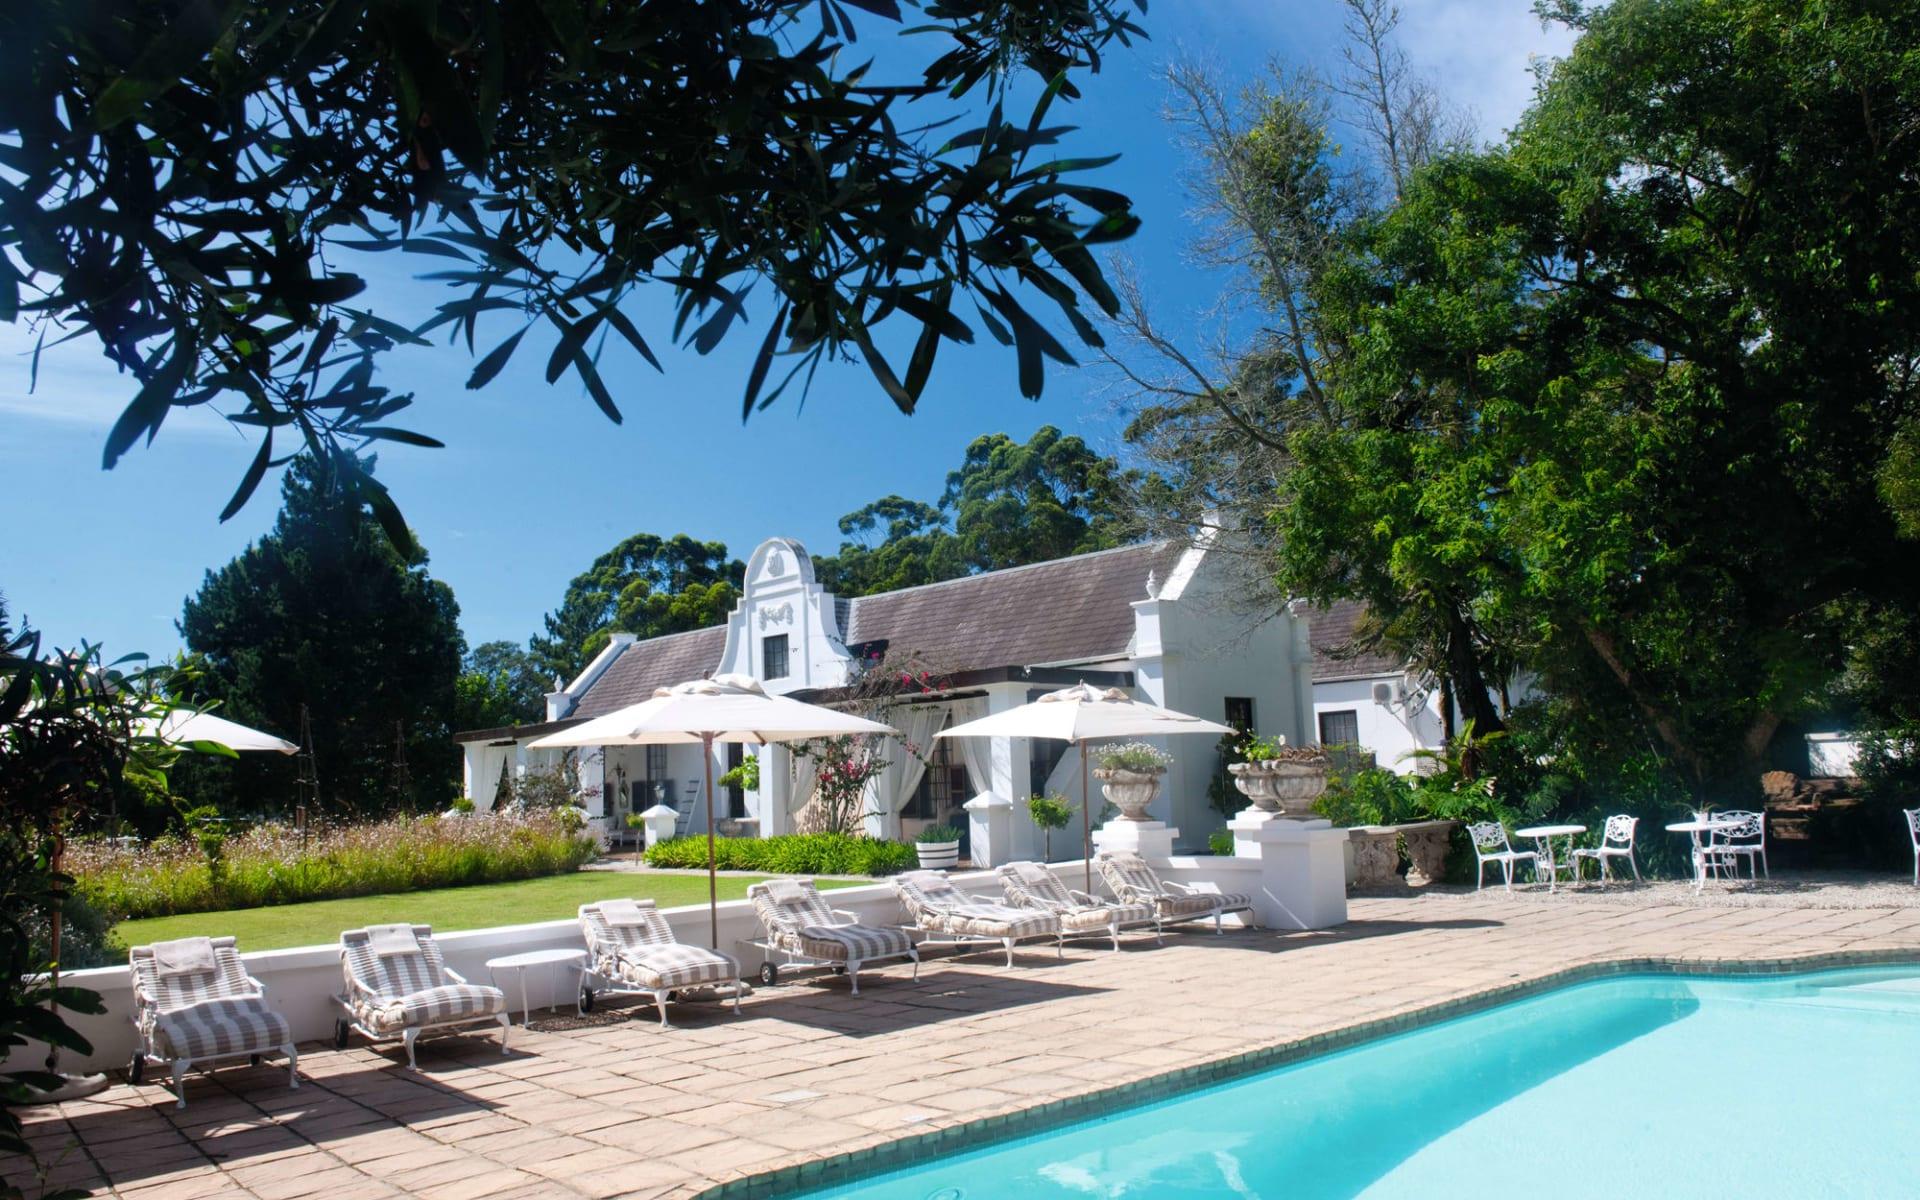 Lairds Lodge Country Estate in Plettenberg Bay: Lairds Lodge  - Aussenansicht mit Pool